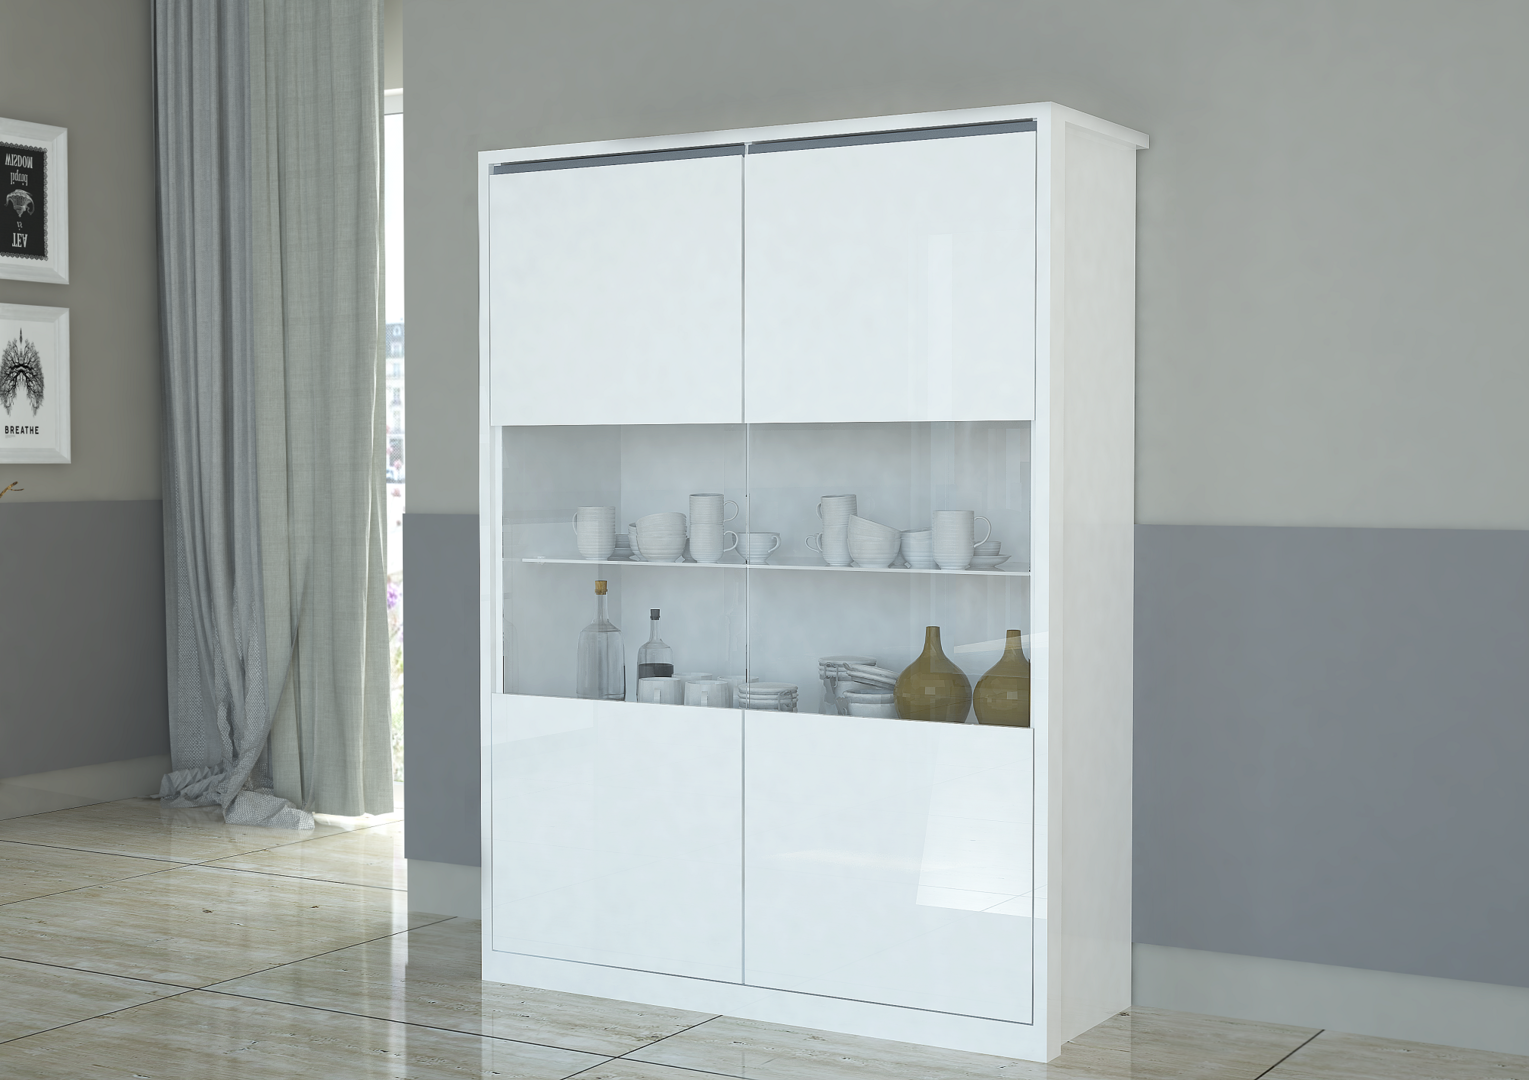 Vetrina moderna avana credenza bianca mobile soggiorno for Mobile soggiorno bianco